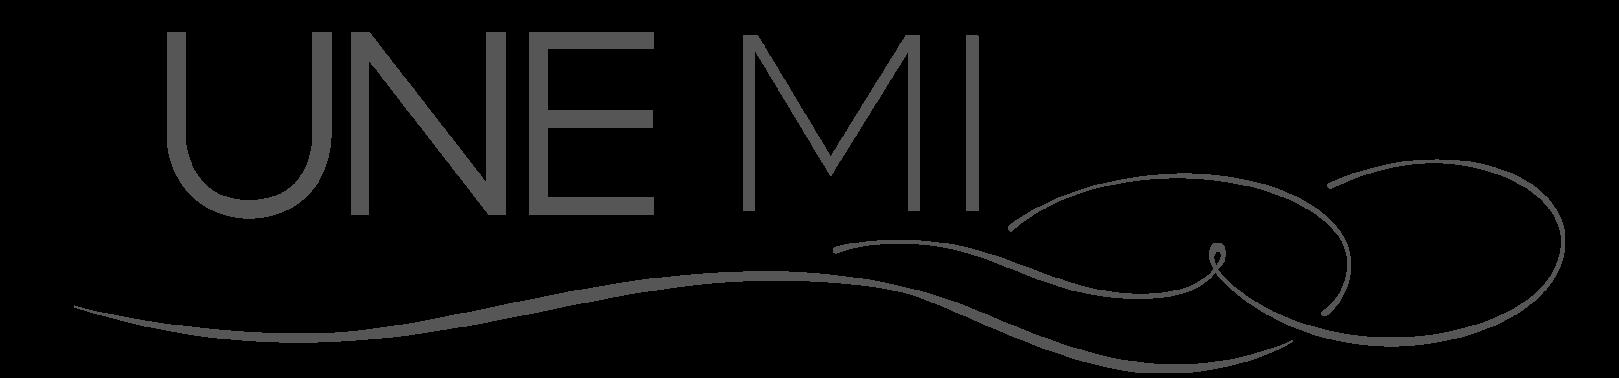 cropped-UneMi-logo-1-2